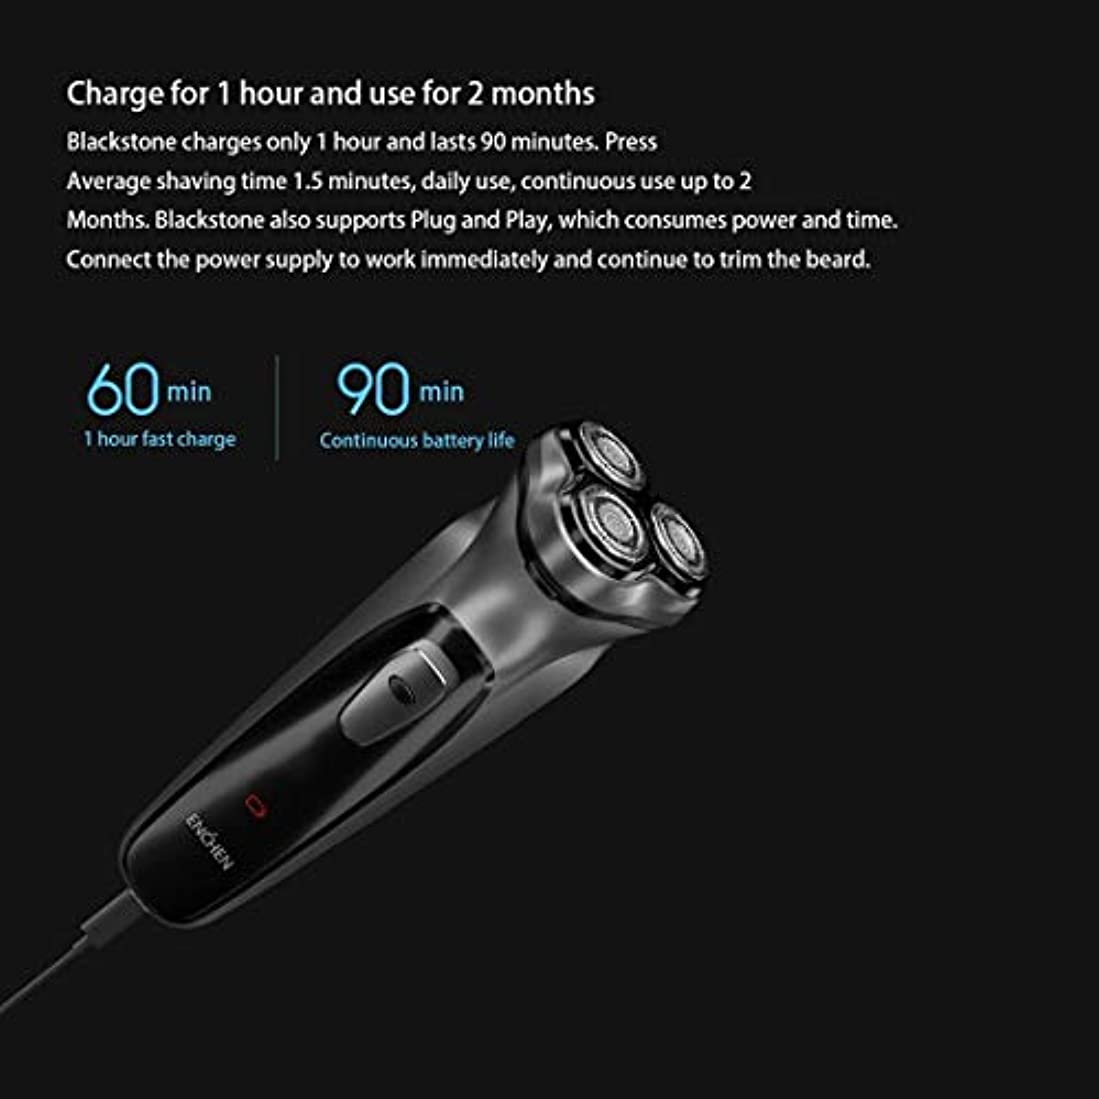 EnjoyLife- 1時間の高速充電長いバッテリー寿命5Wハイパワー3Dサスペンションダブルリング研削ヘッドインテリジェントアンチピンチひげ男性電気かみそり